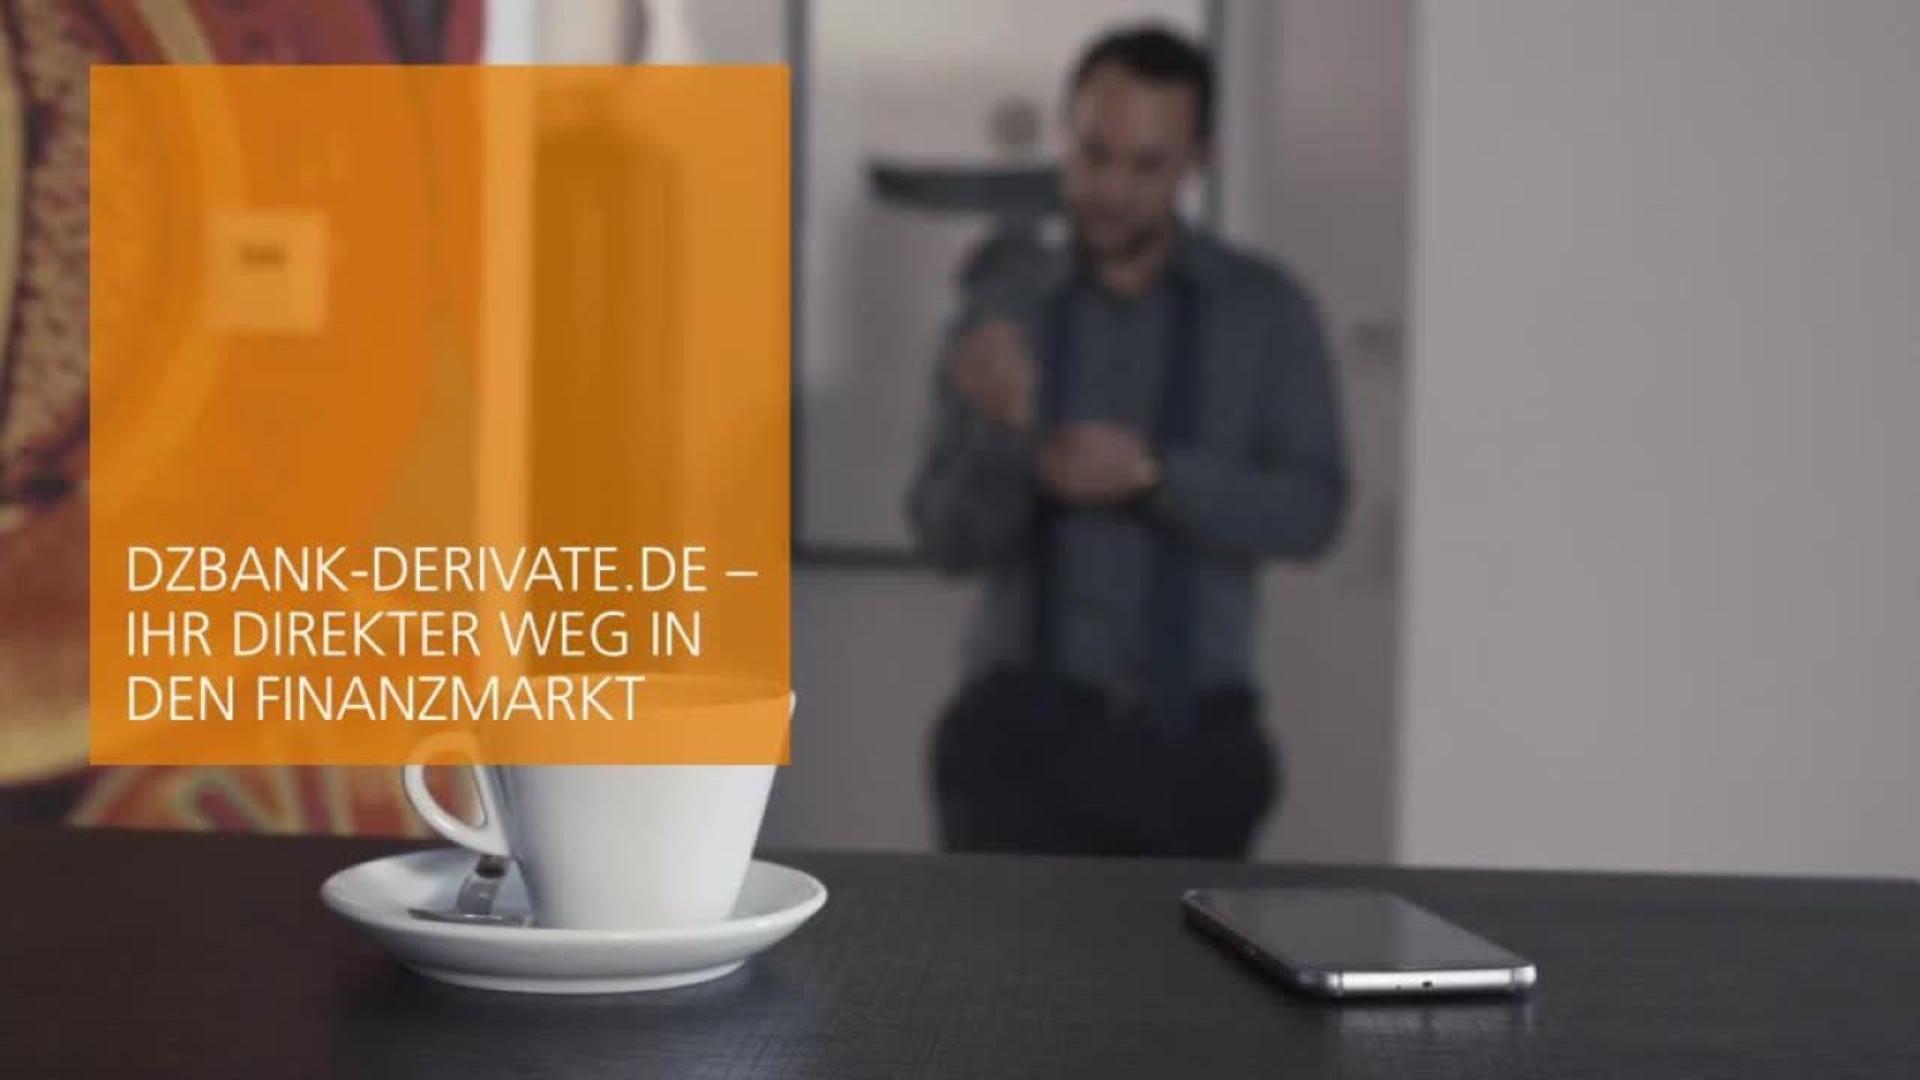 dzbank-derivate.de - Der Film